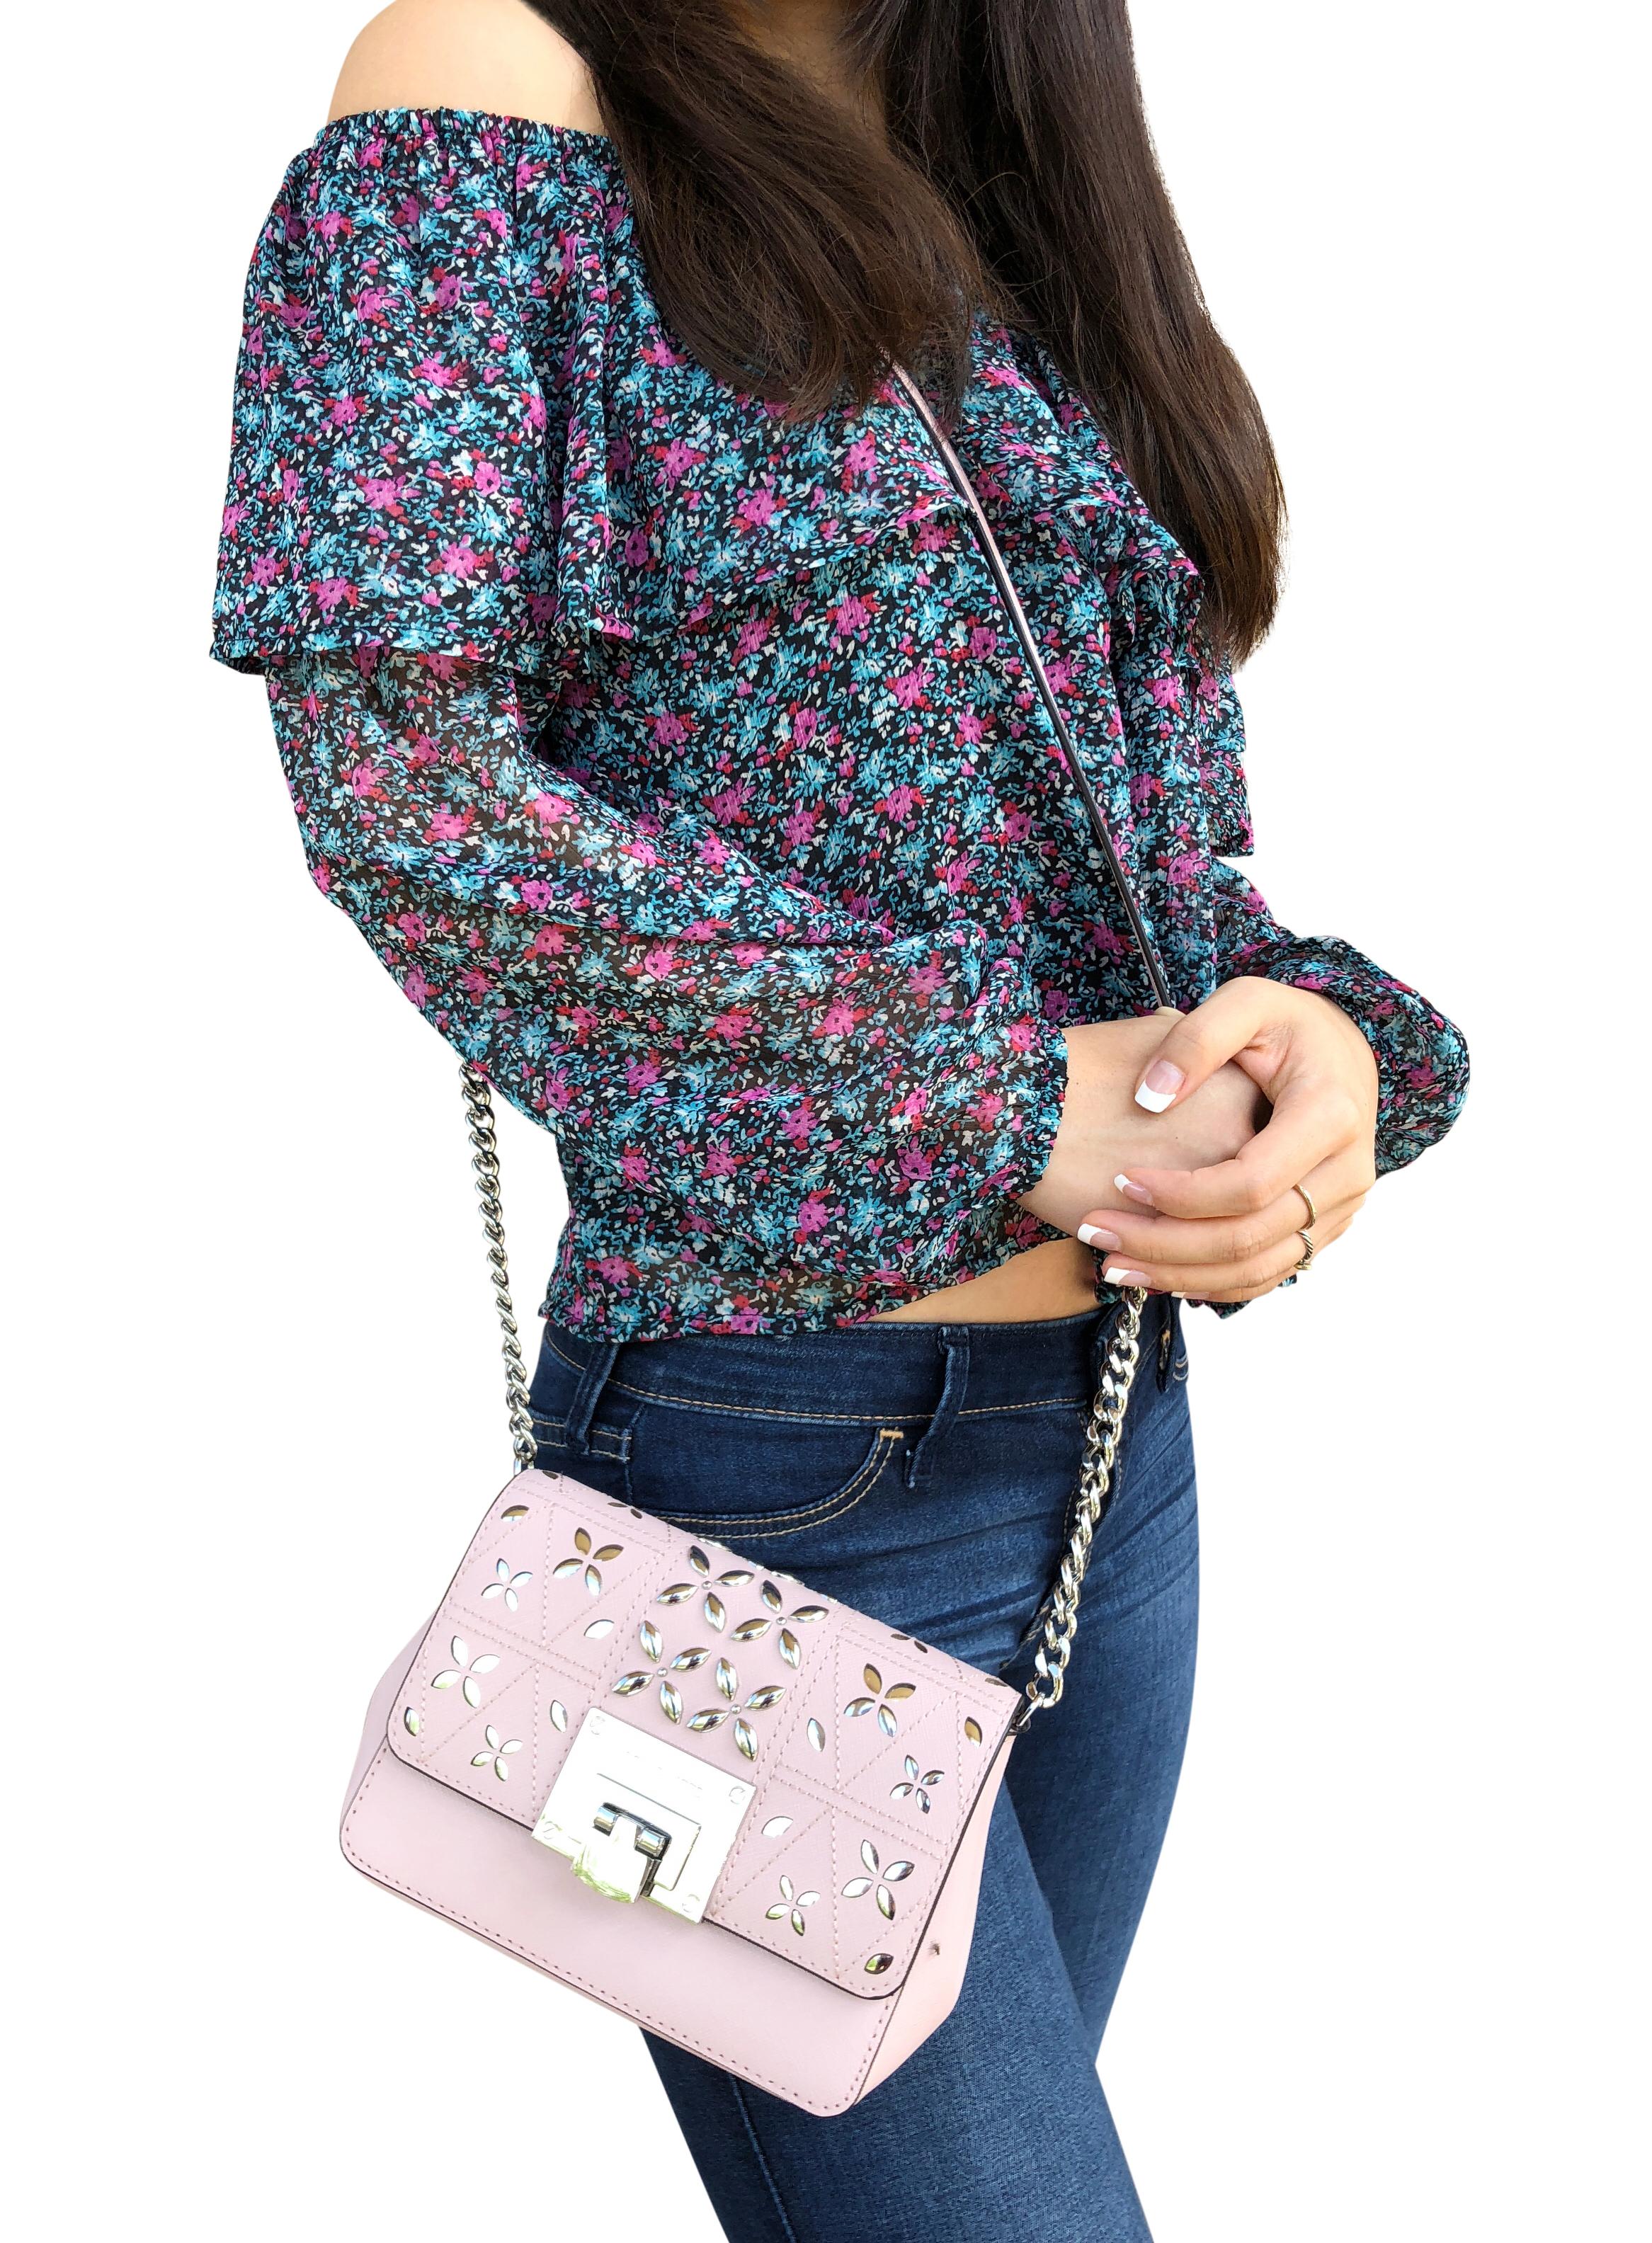 b65e0f01abf3 Michael Kors Tina Stud Small Clutch Bag Crossody Blossom Pink Floral  Perforated